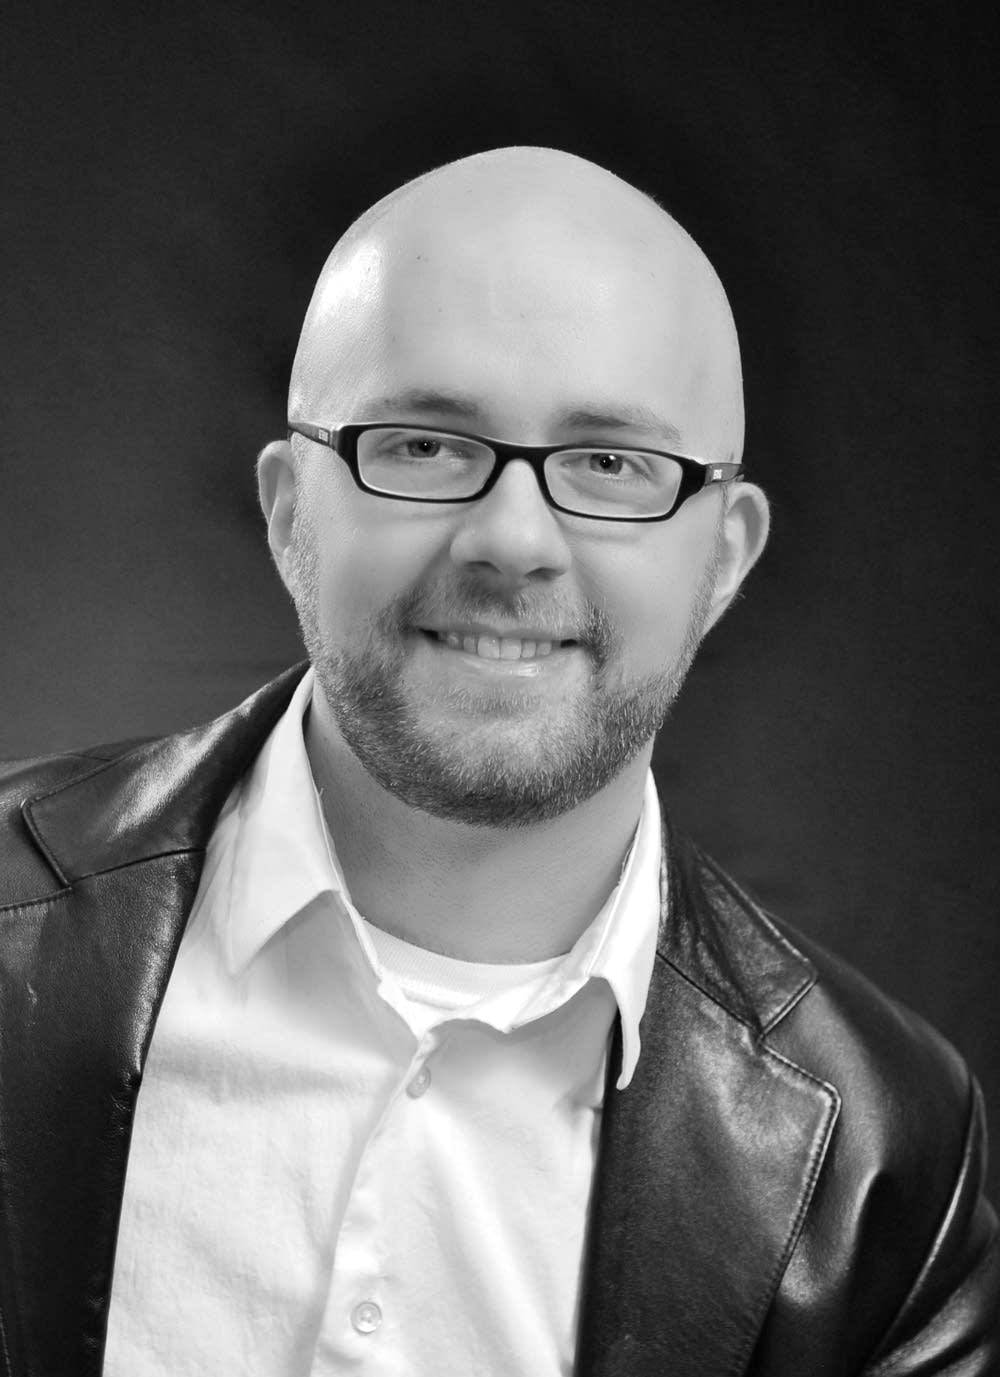 Composer Troy Strand